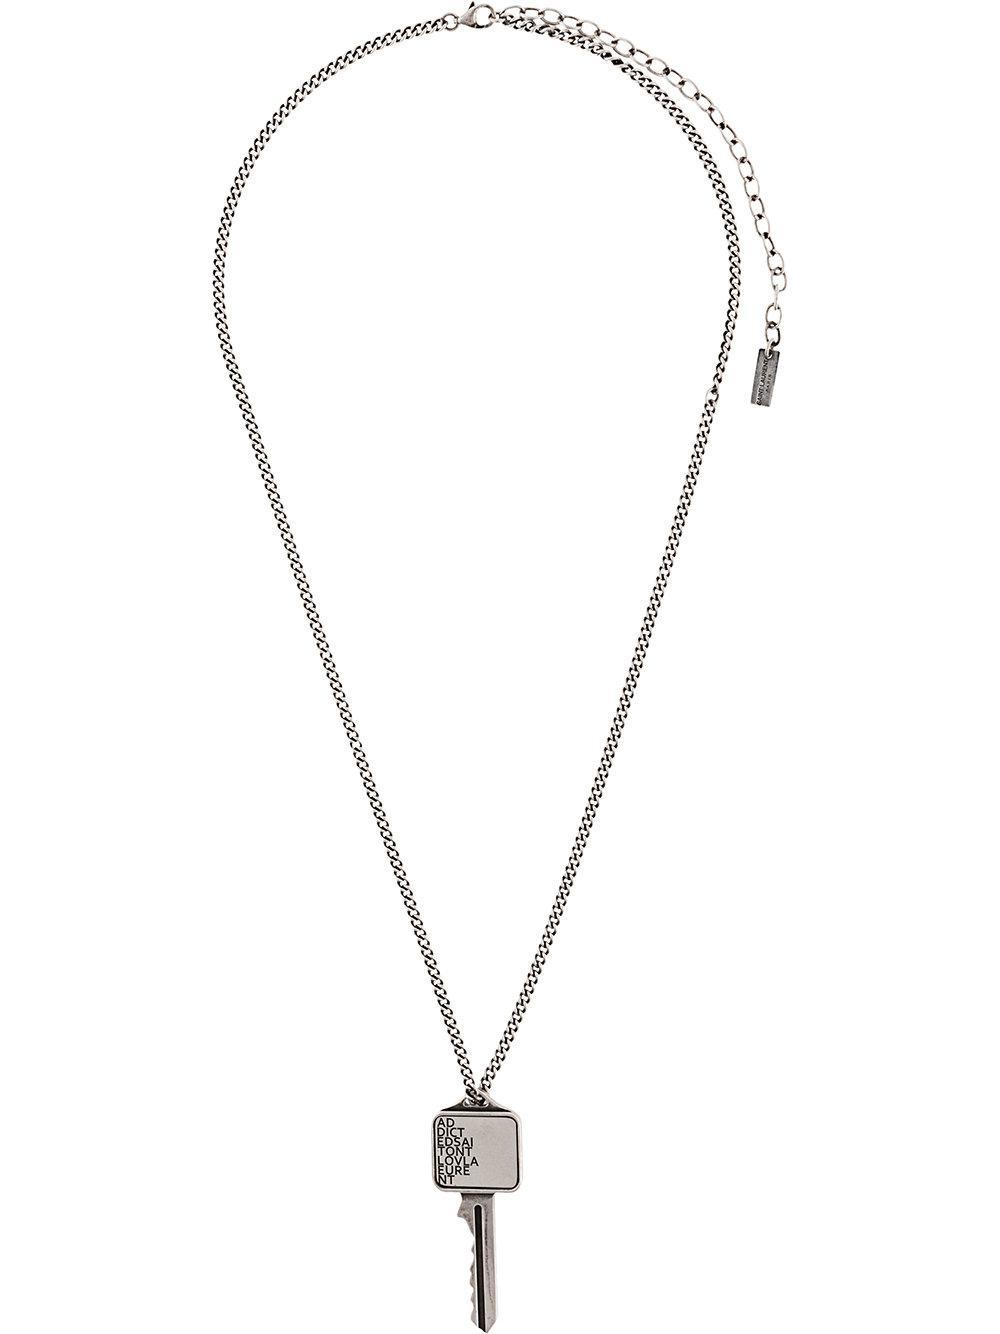 c293bf62f76 Saint Laurent Etched Key Pendant Necklace in Metallic for Men - Lyst